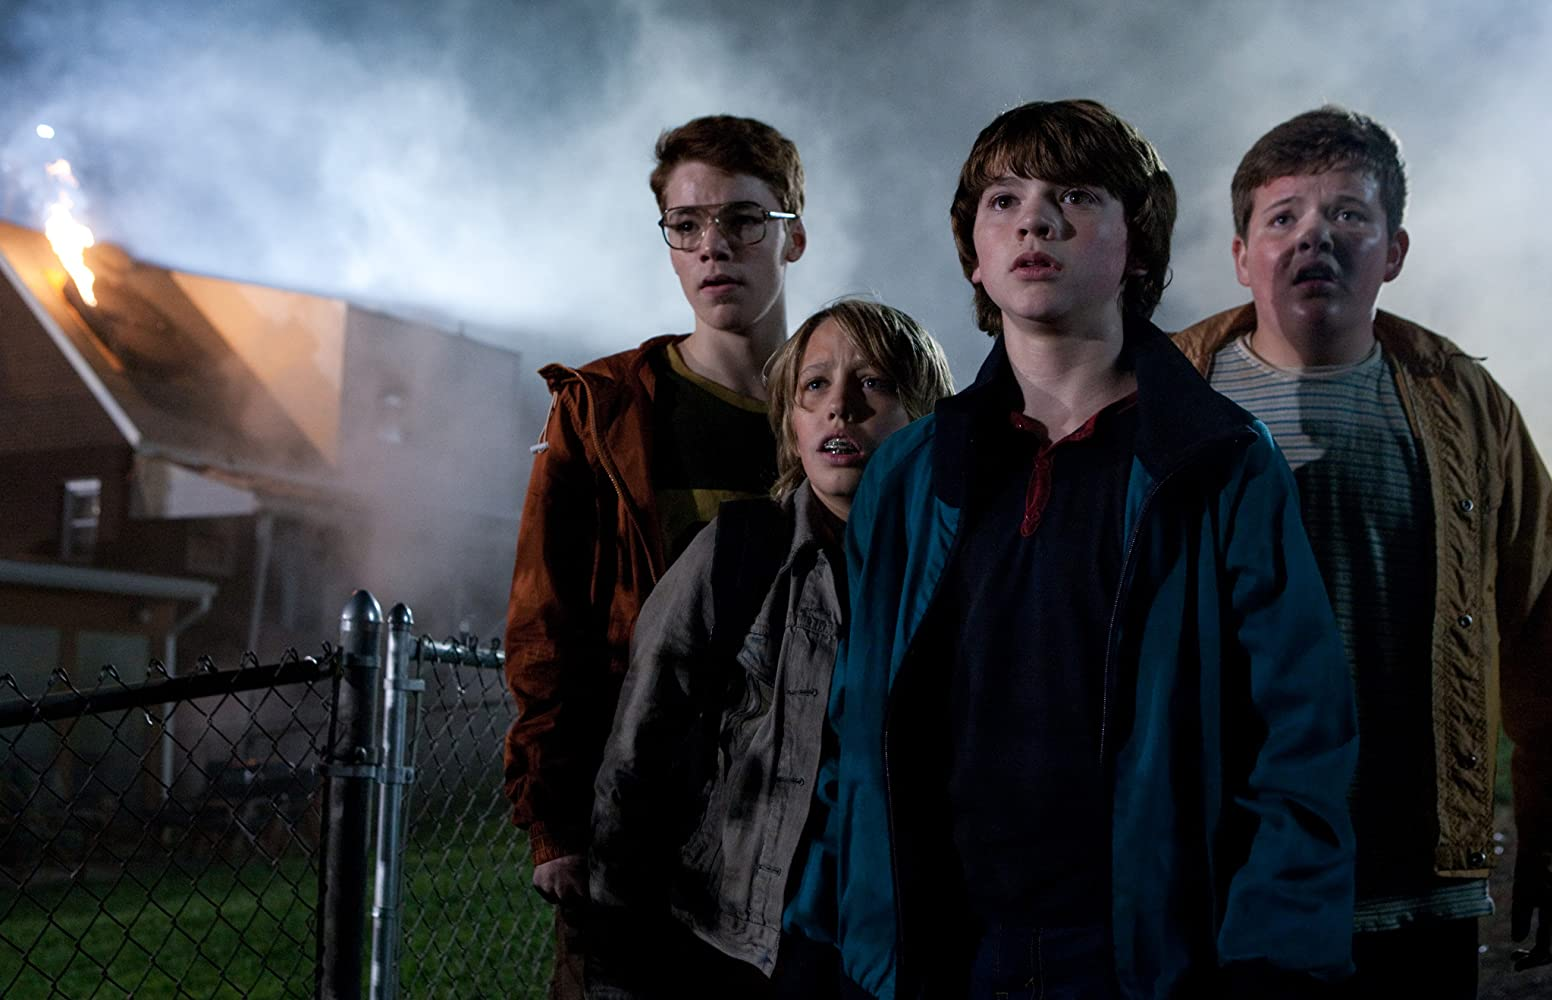 Joel Courtney, Ryan Lee, Gabriel Basso, and Riley Griffiths in Super 8 (2011)